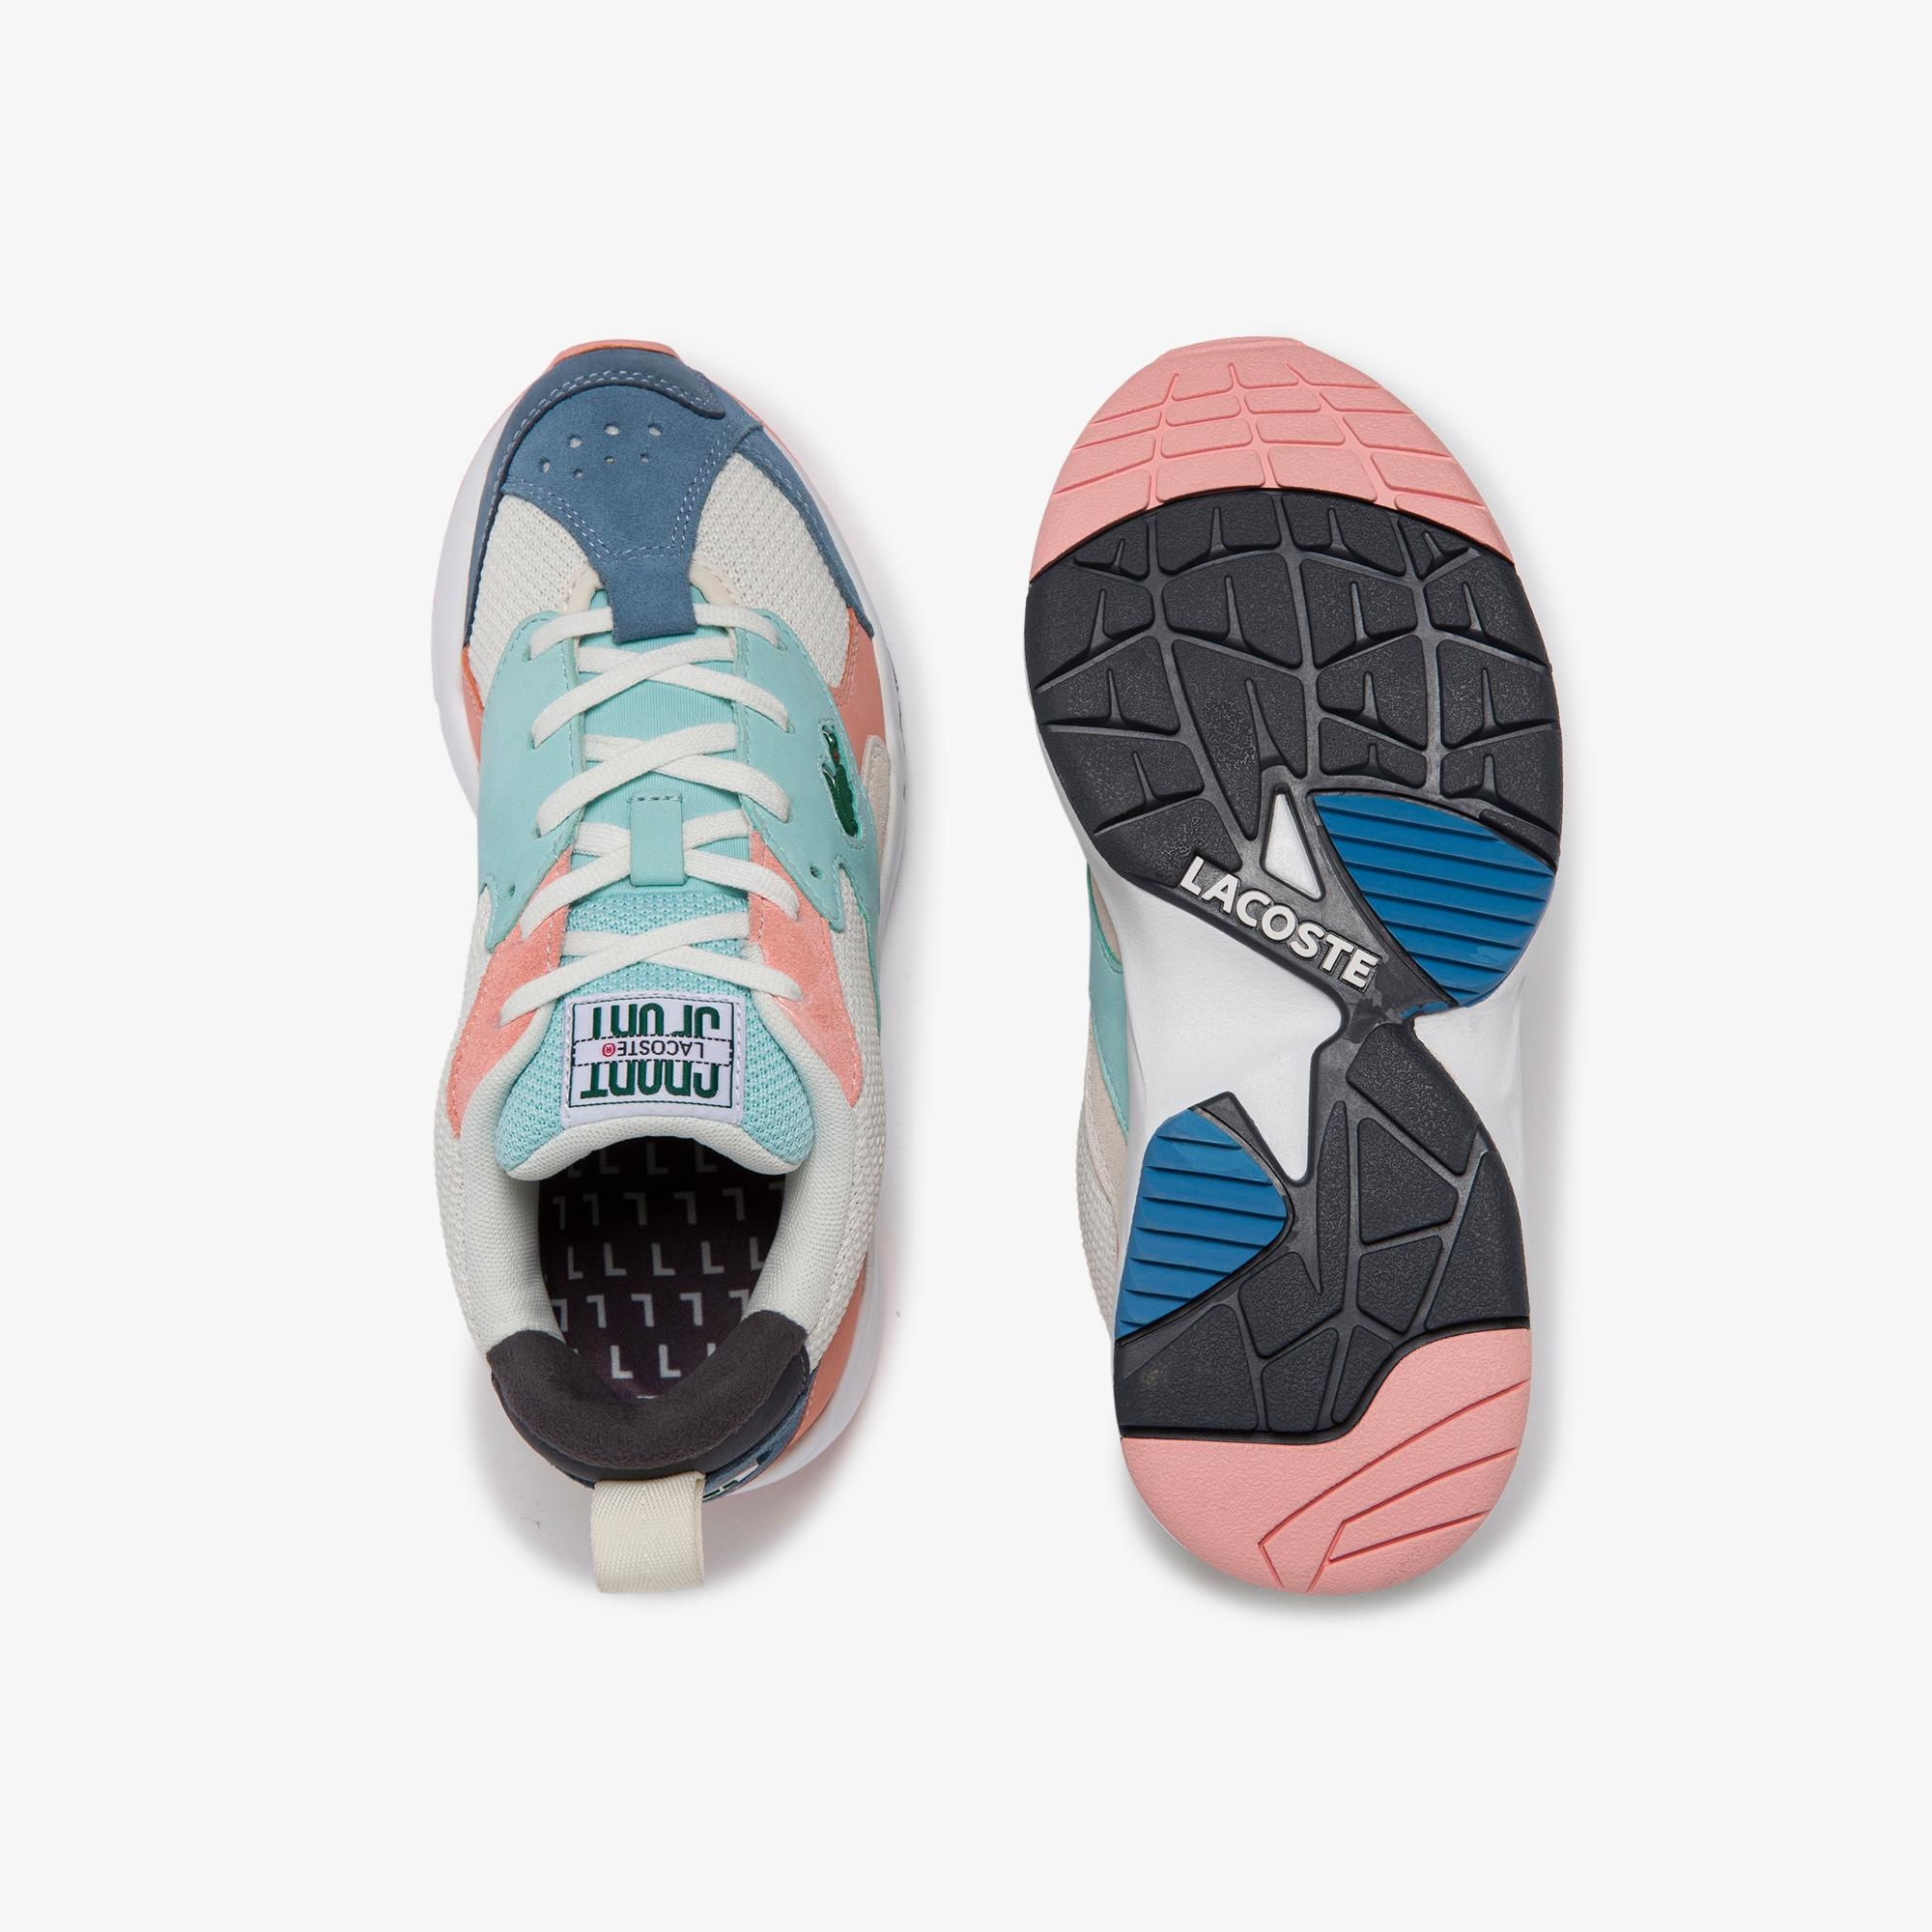 Lacoste Storm 96 120 3 US Damskie Sneakersy